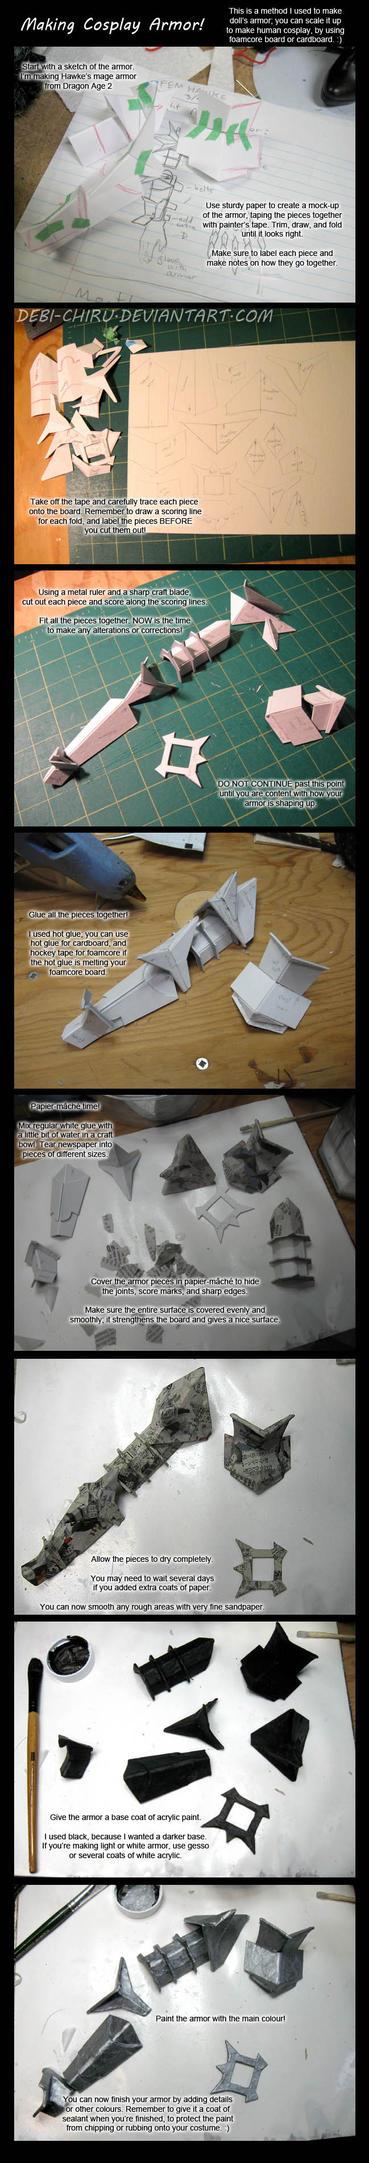 Tutorial: Making Armor by Fylgjur